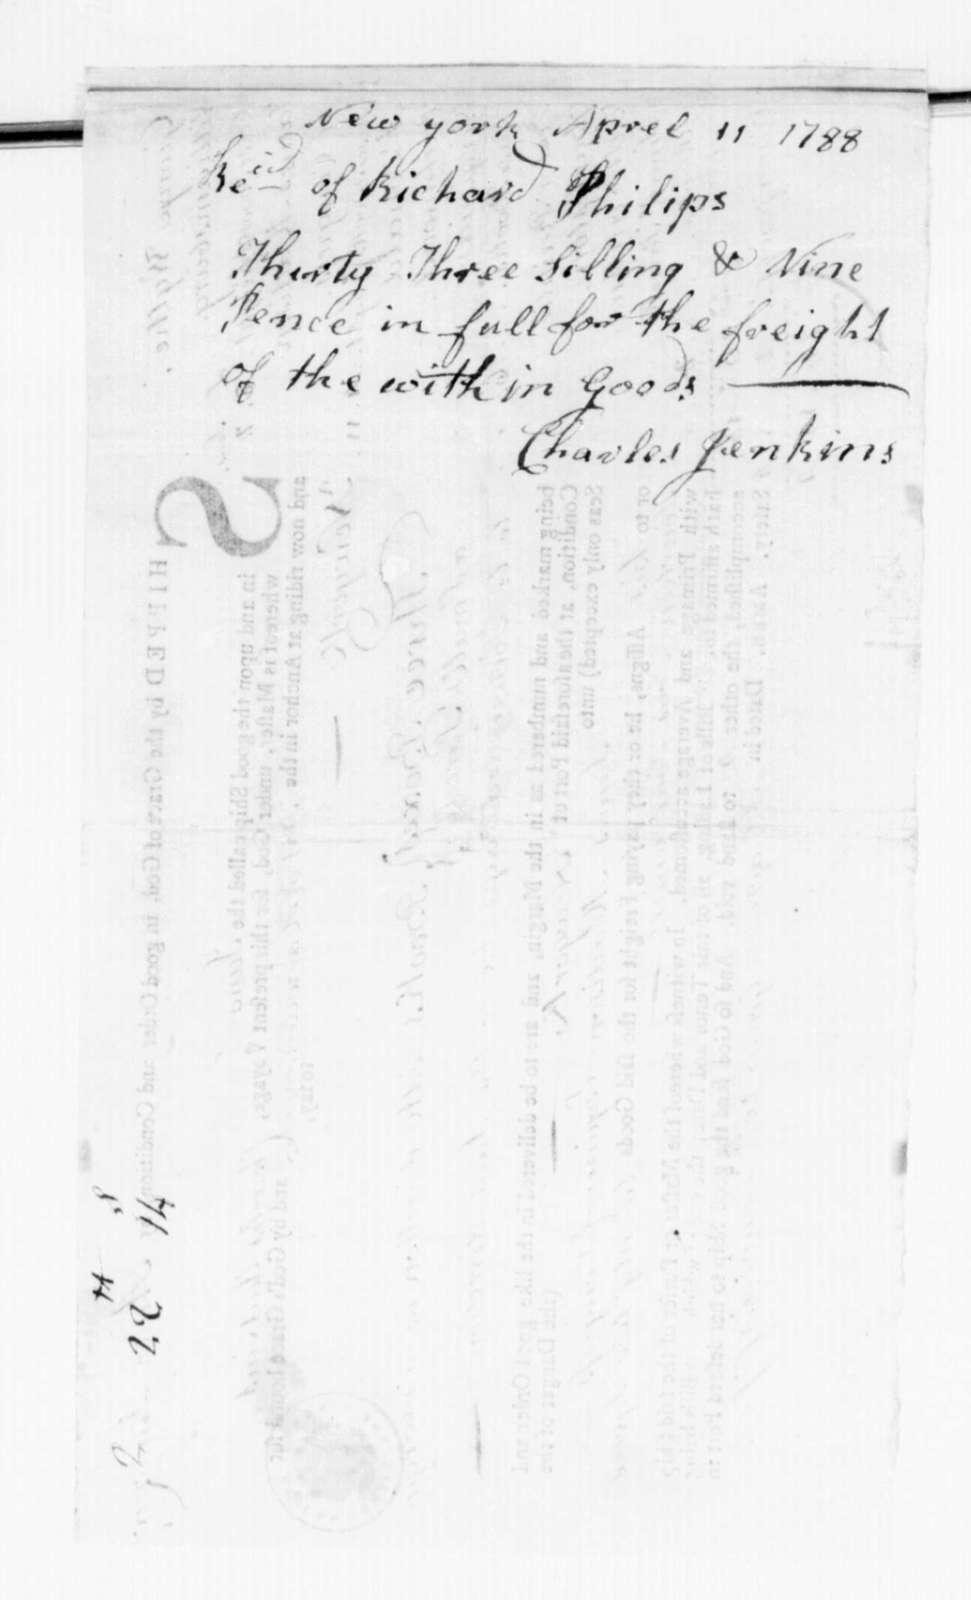 André Limozin to James Madison, December 20, 1787. Bill of Lading.